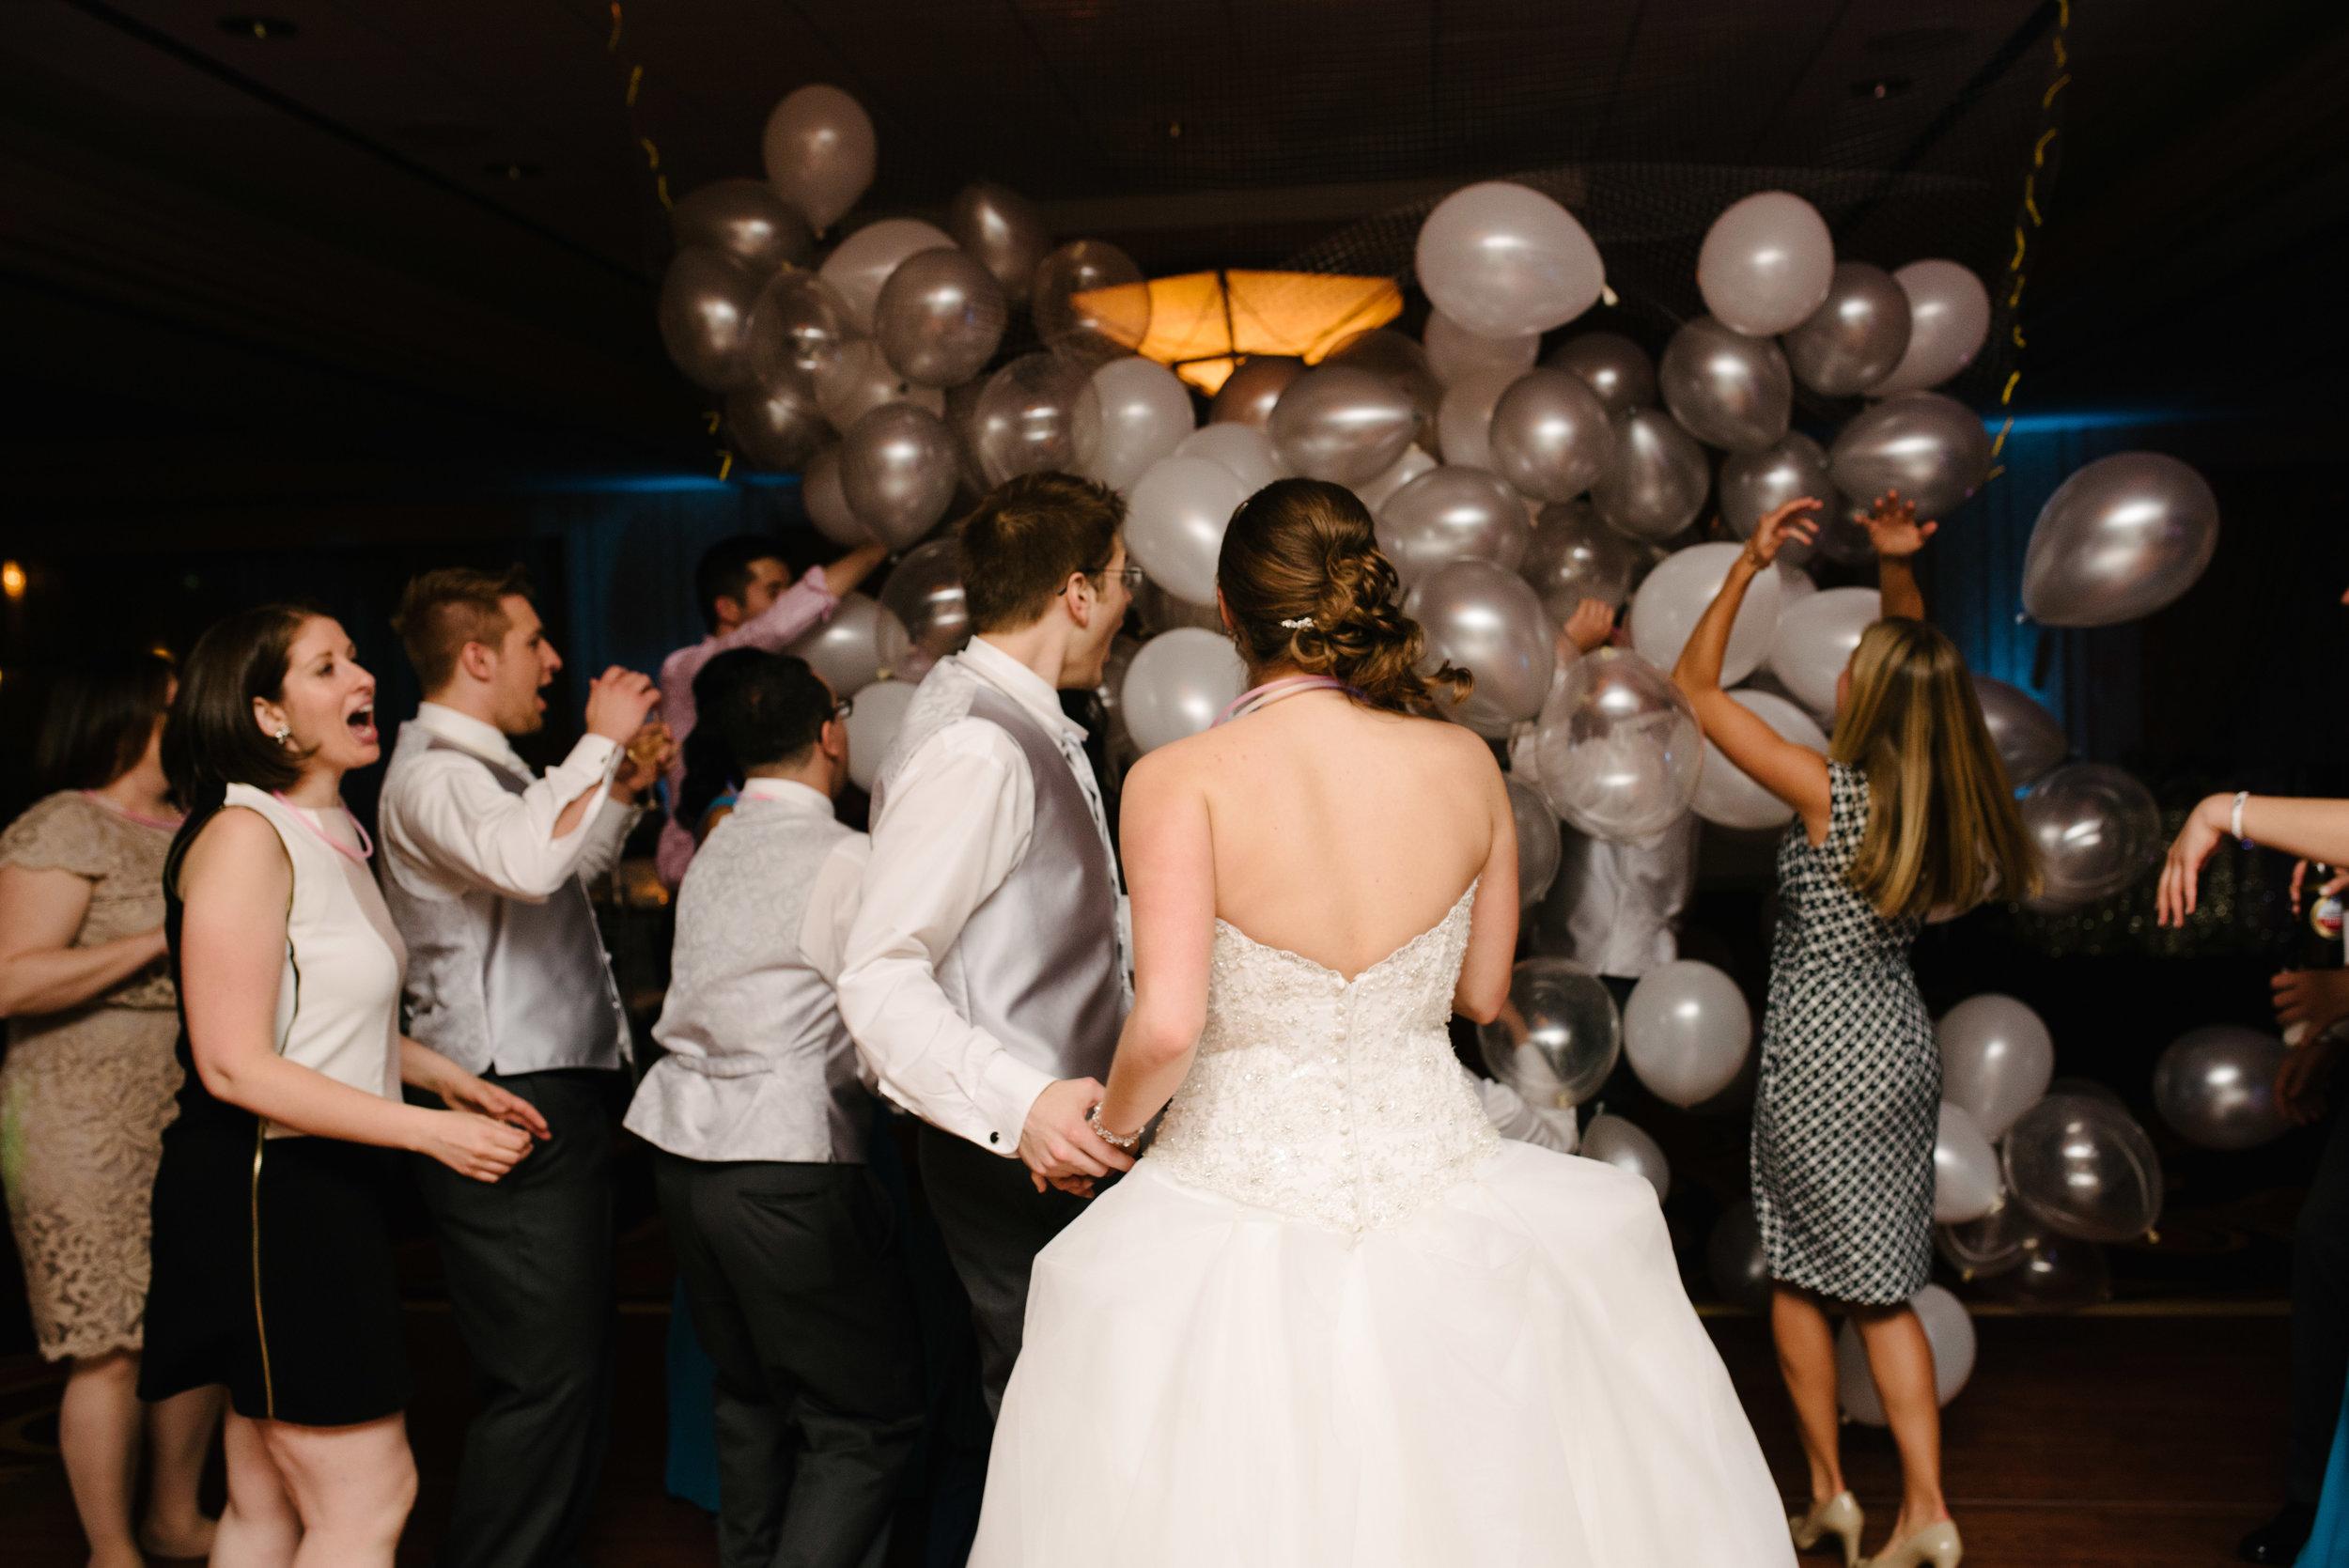 Balloon drop ballroom wedding reception // The Miner Details weddings